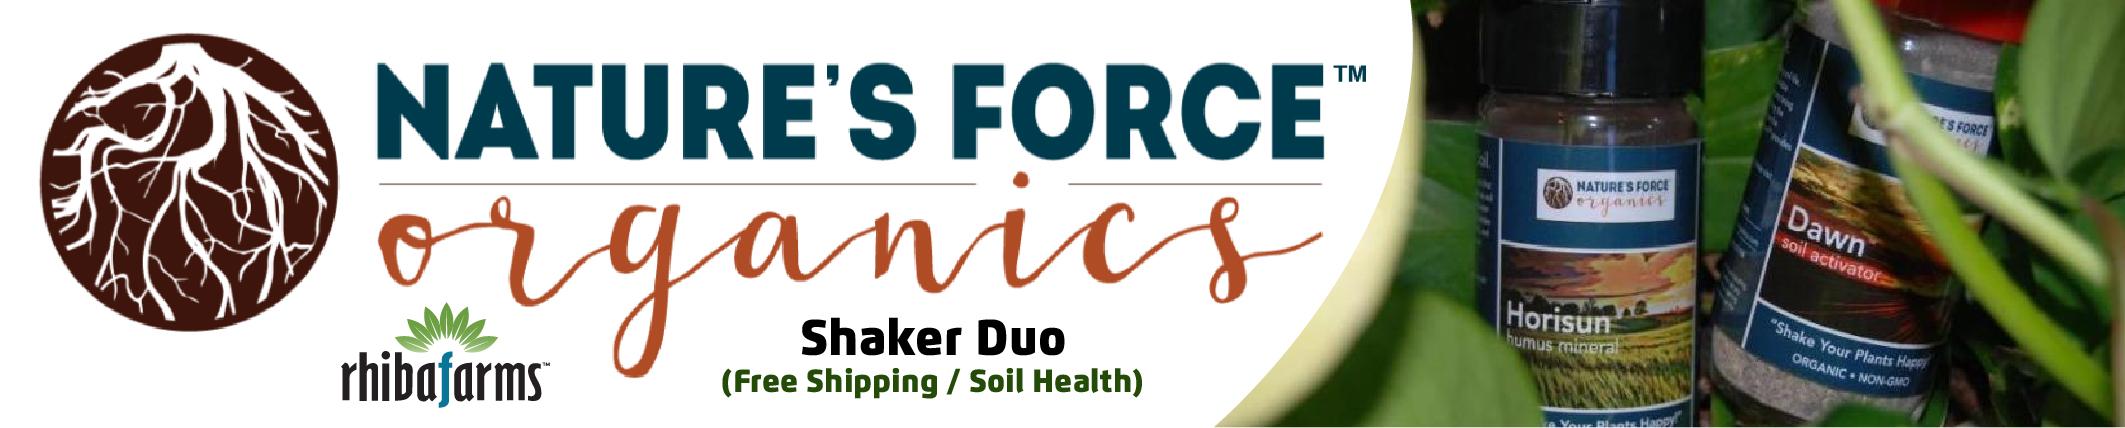 Natures Force Organics Shaker Duo